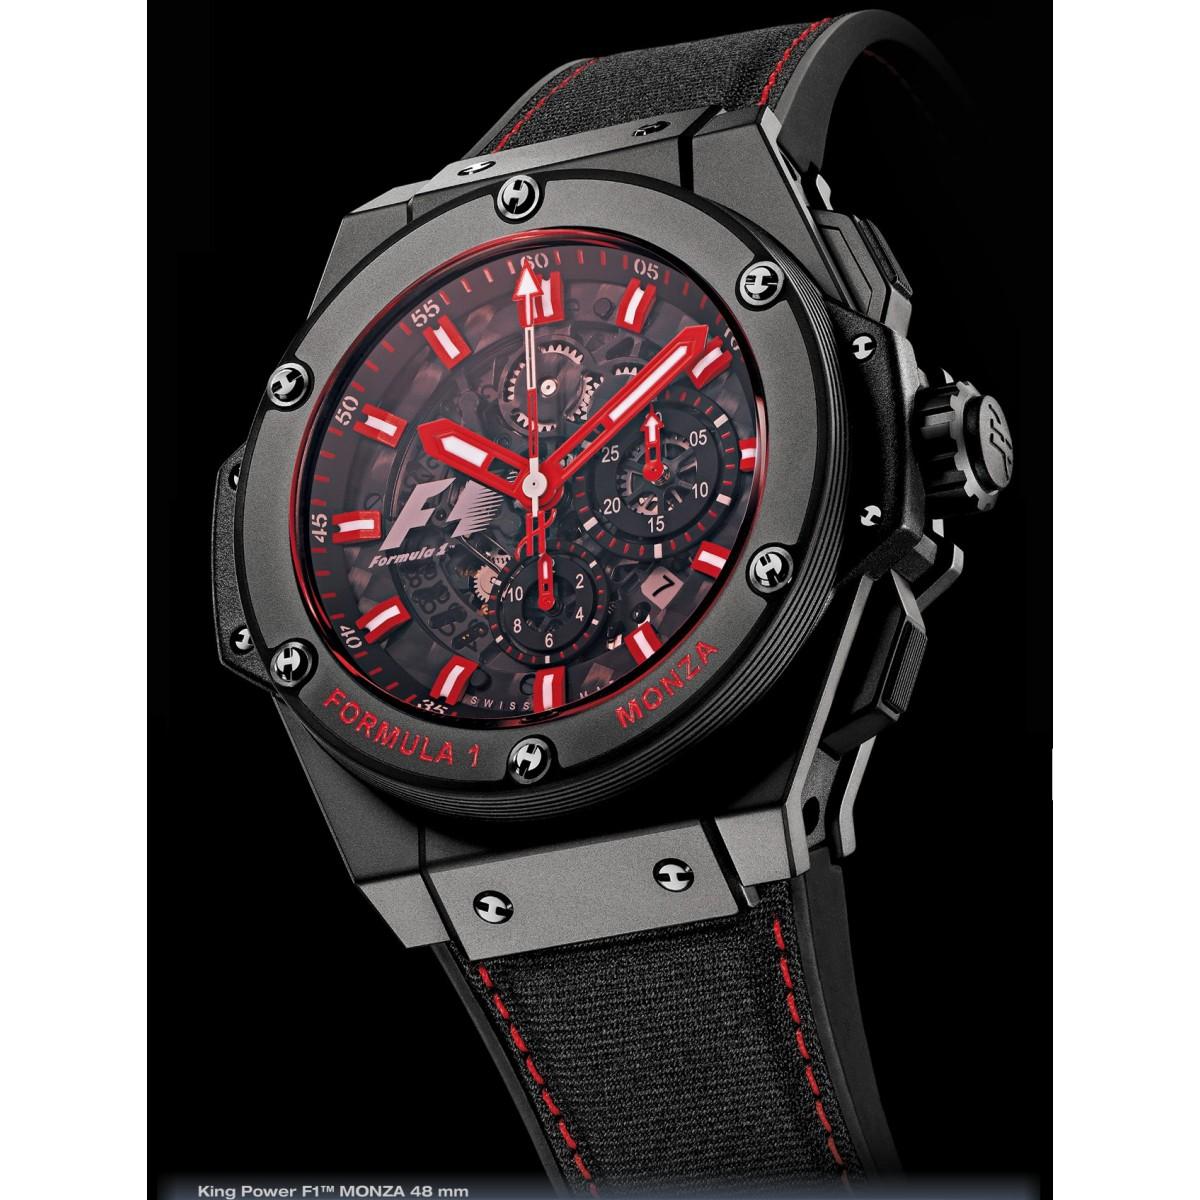 a989f181328 Relógio Réplica Hublot Formula1 Monza